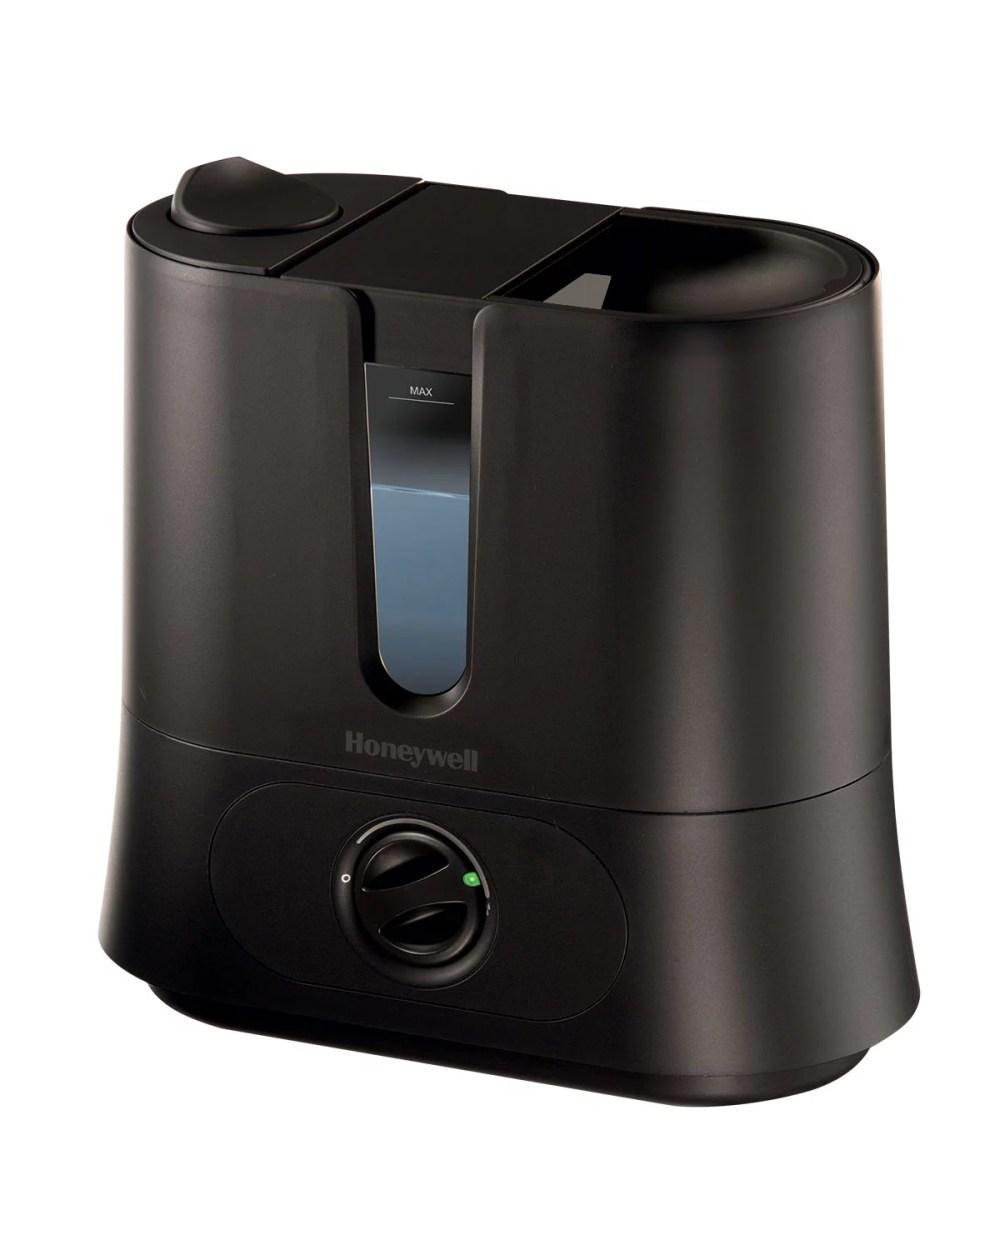 medium resolution of honeywell topfill humidifier black hul570wnf